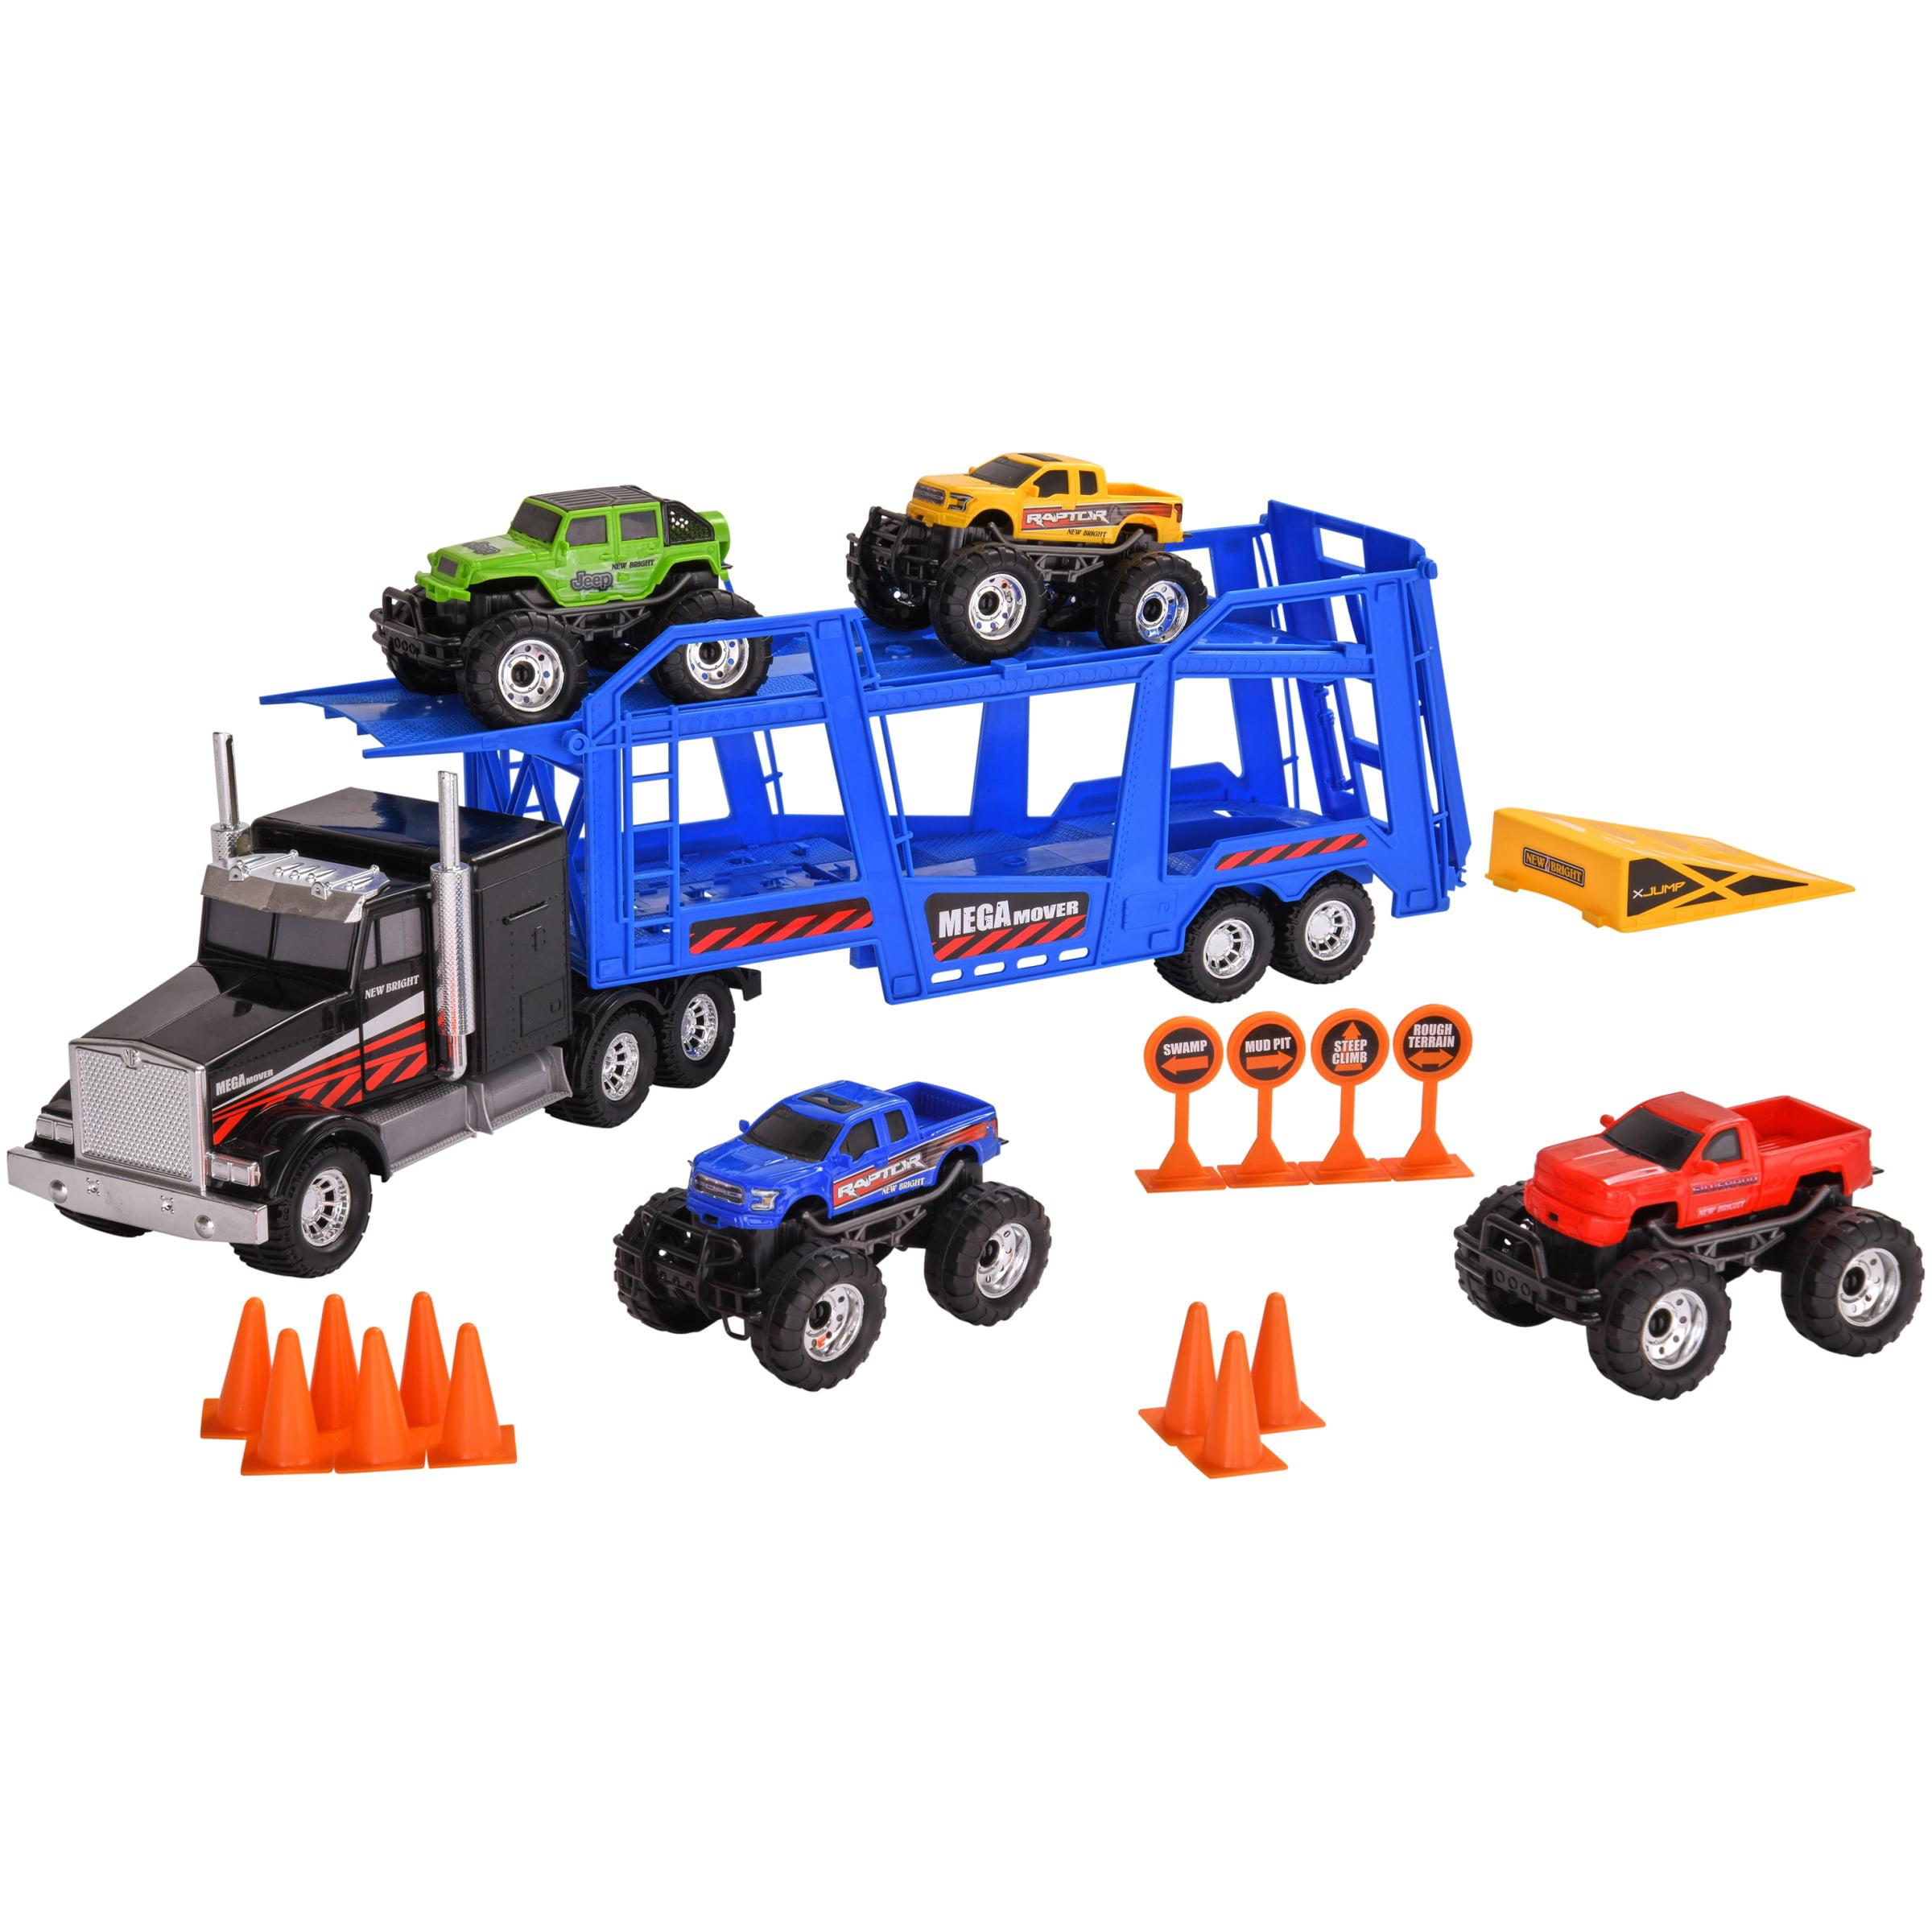 Adventure Force Vehicle Transporter, Black, 20 Pieces